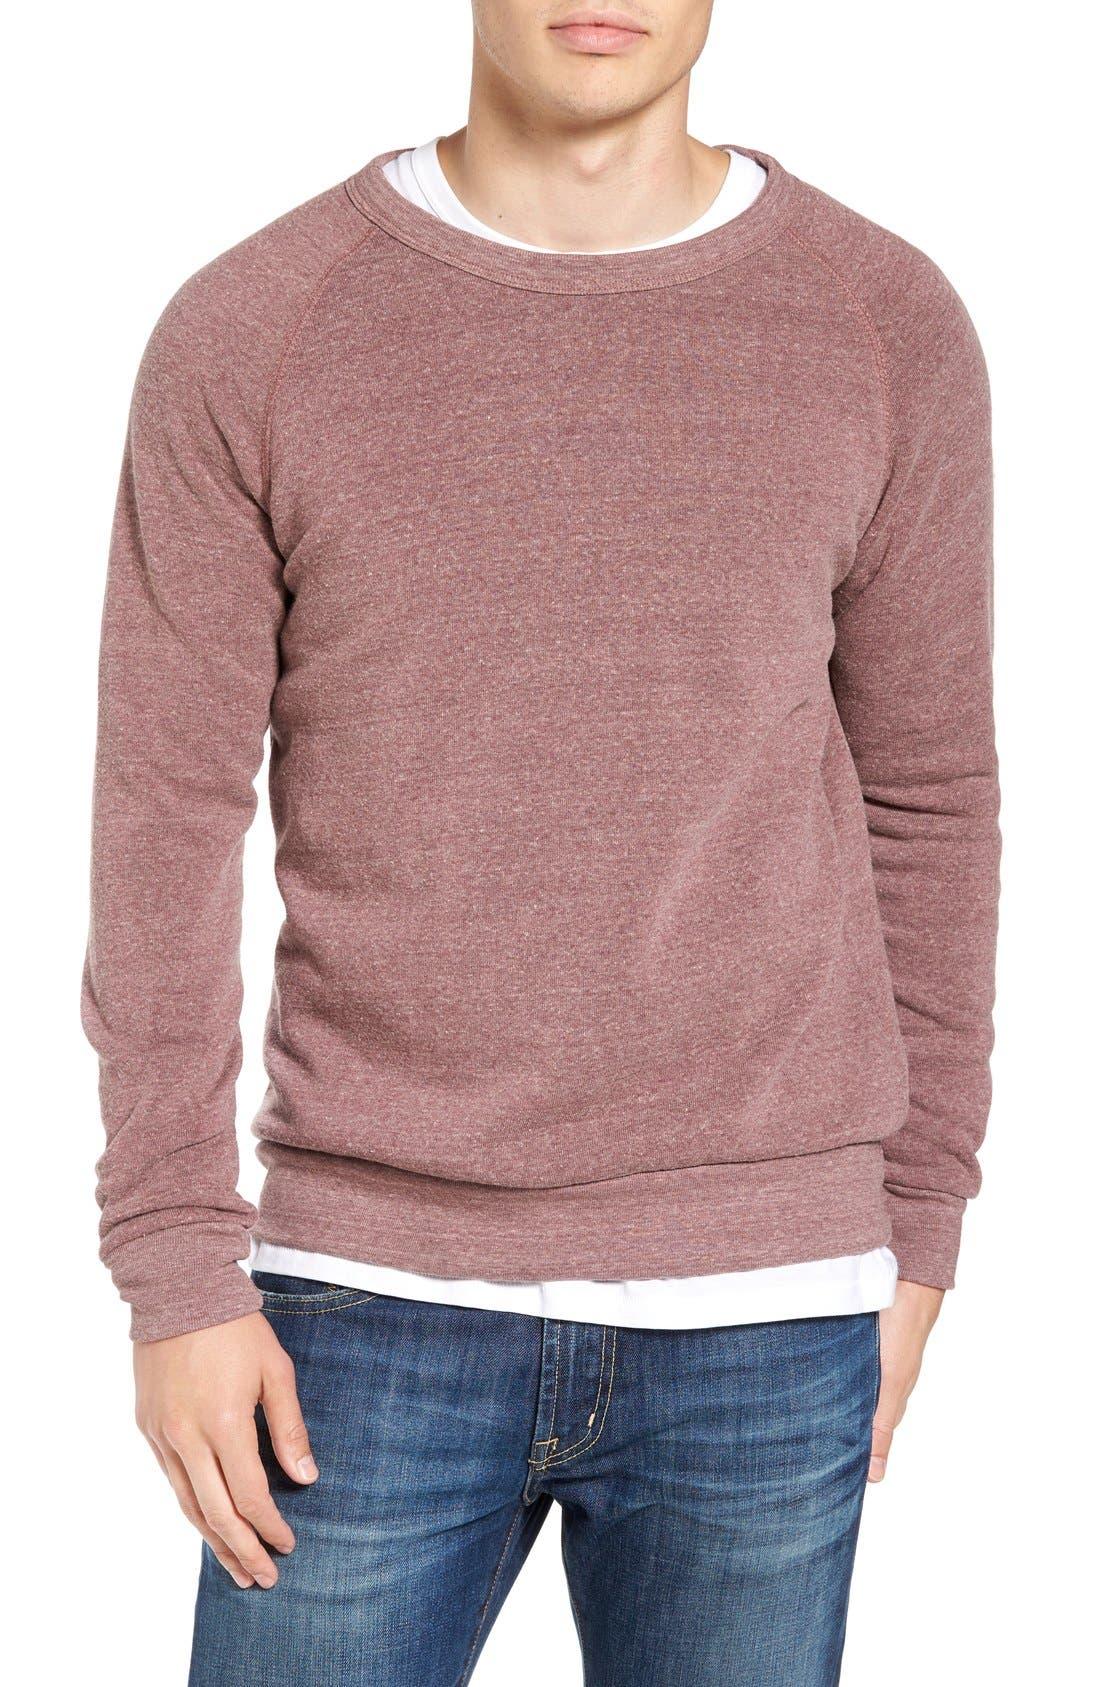 'The Champ' Sweatshirt,                             Main thumbnail 14, color,